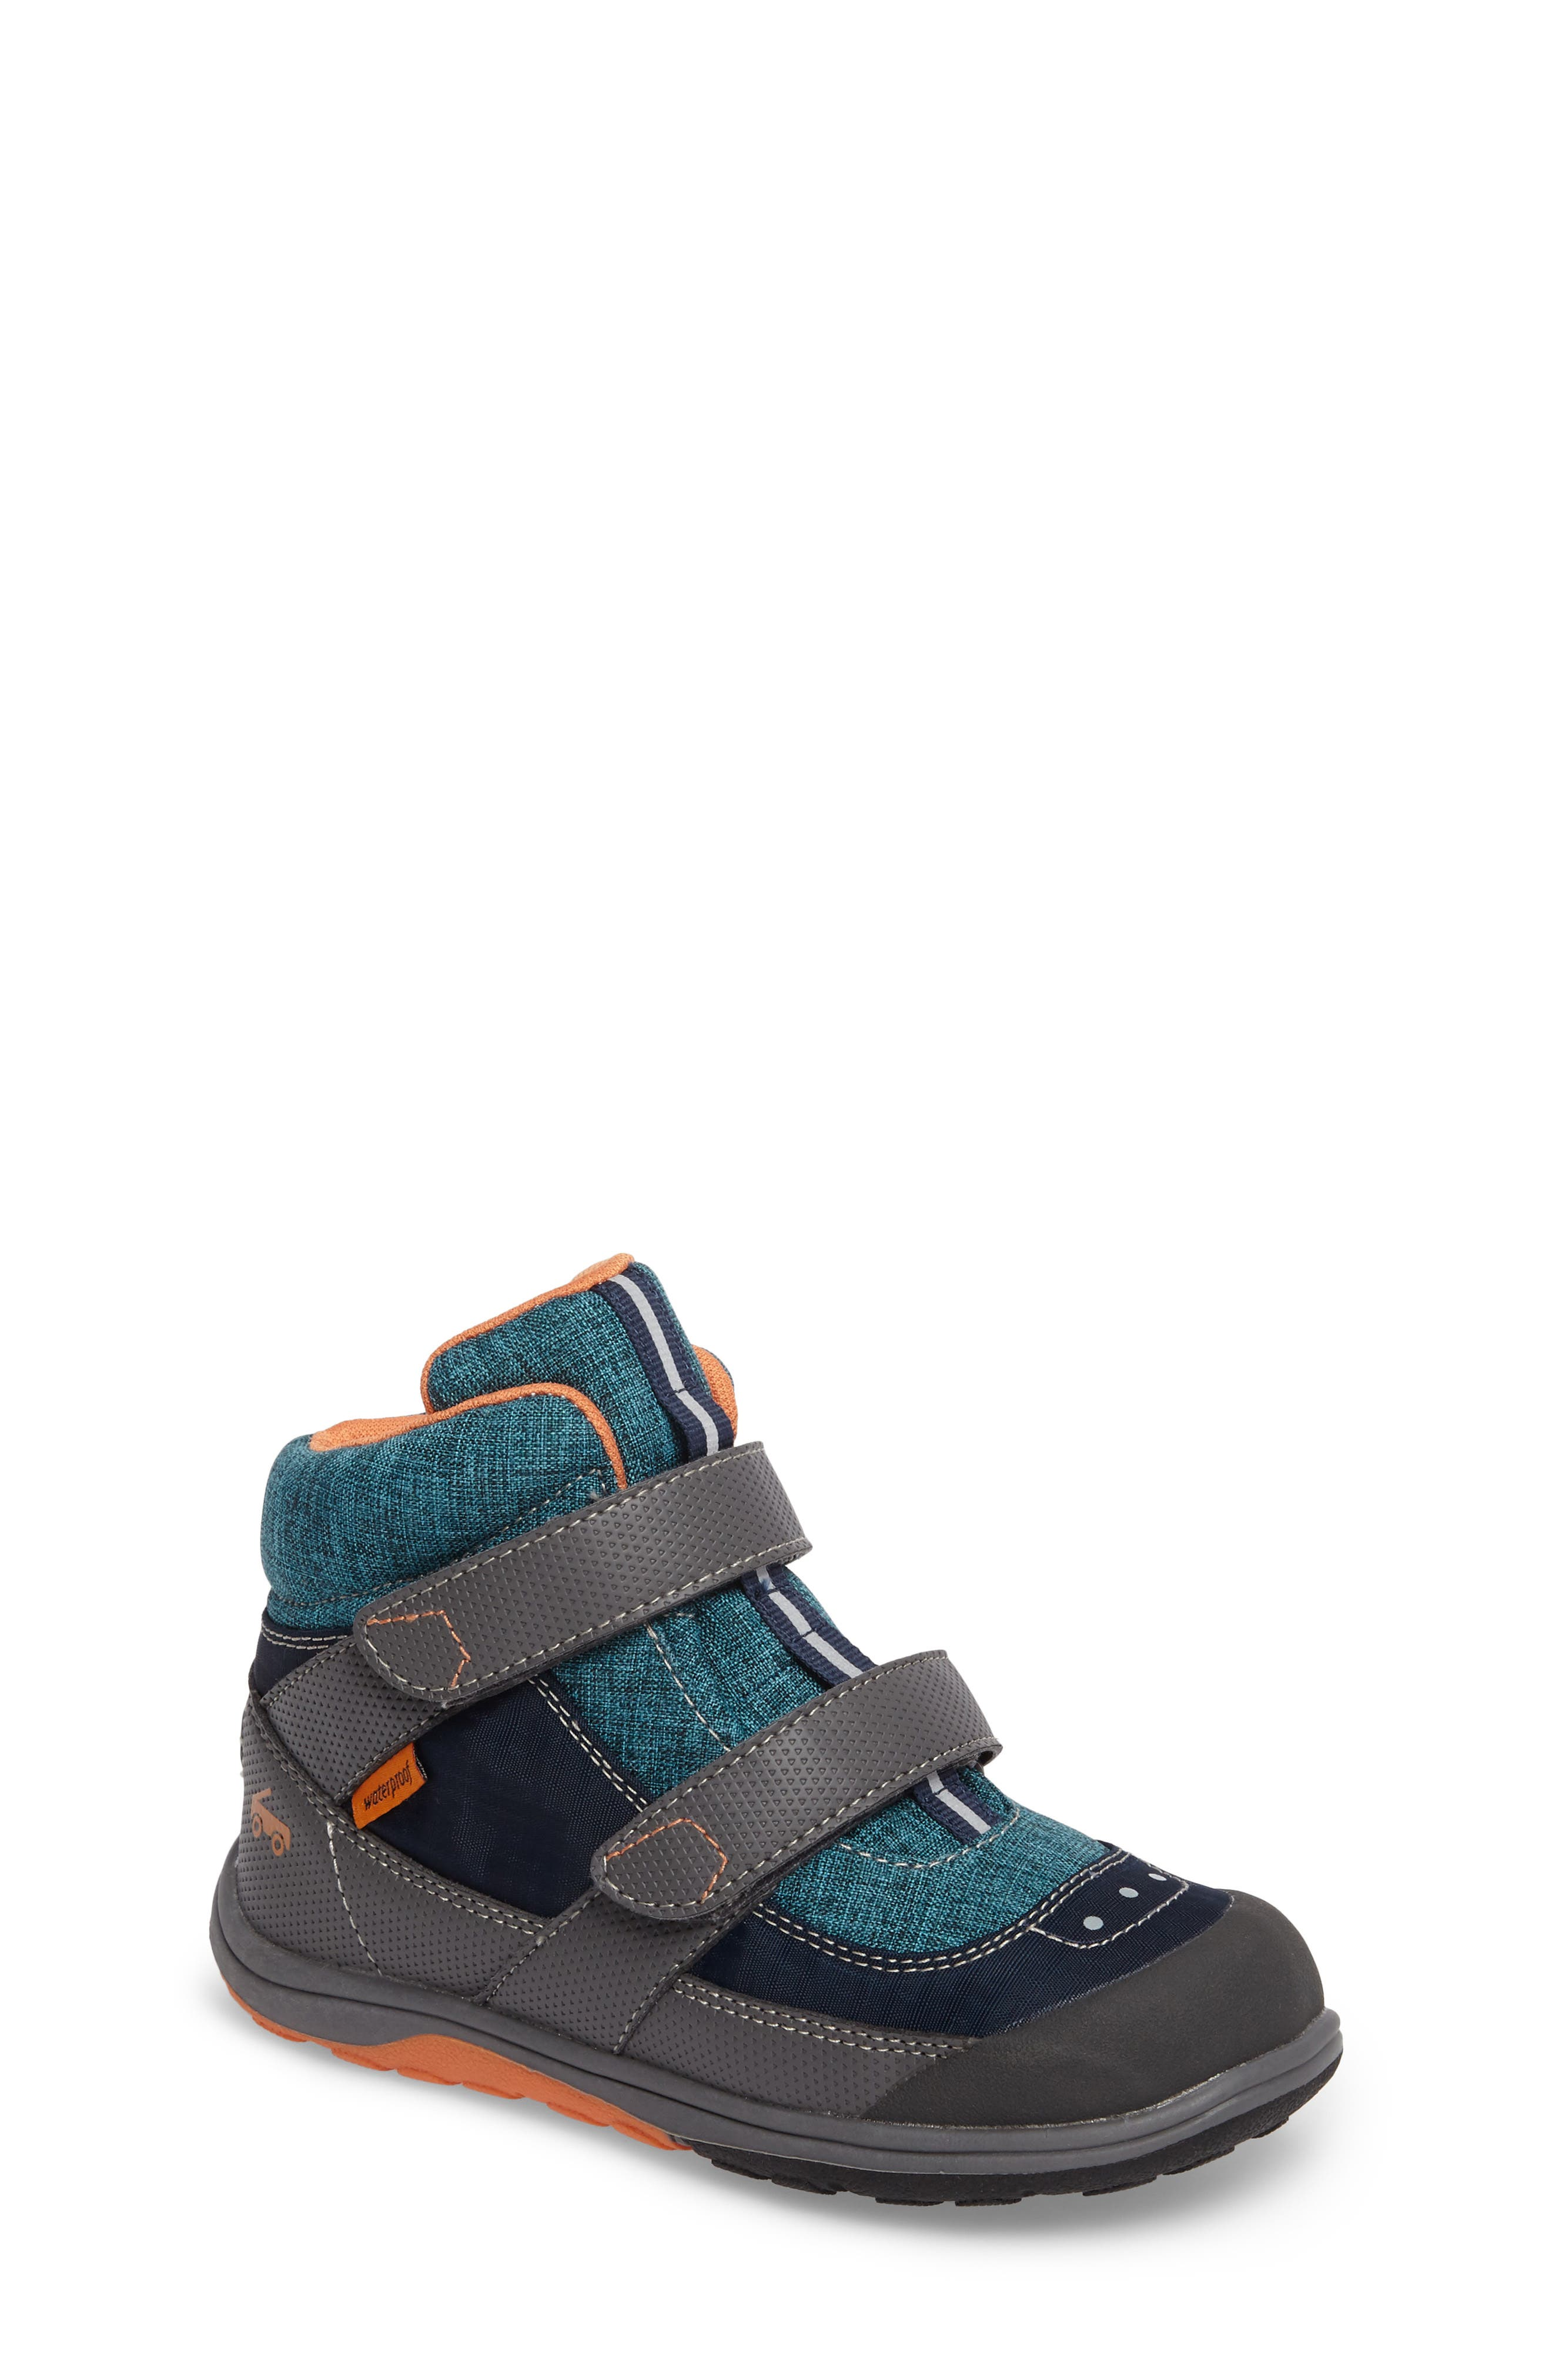 'Atlas' Waterproof Boot,                         Main,                         color, Blue